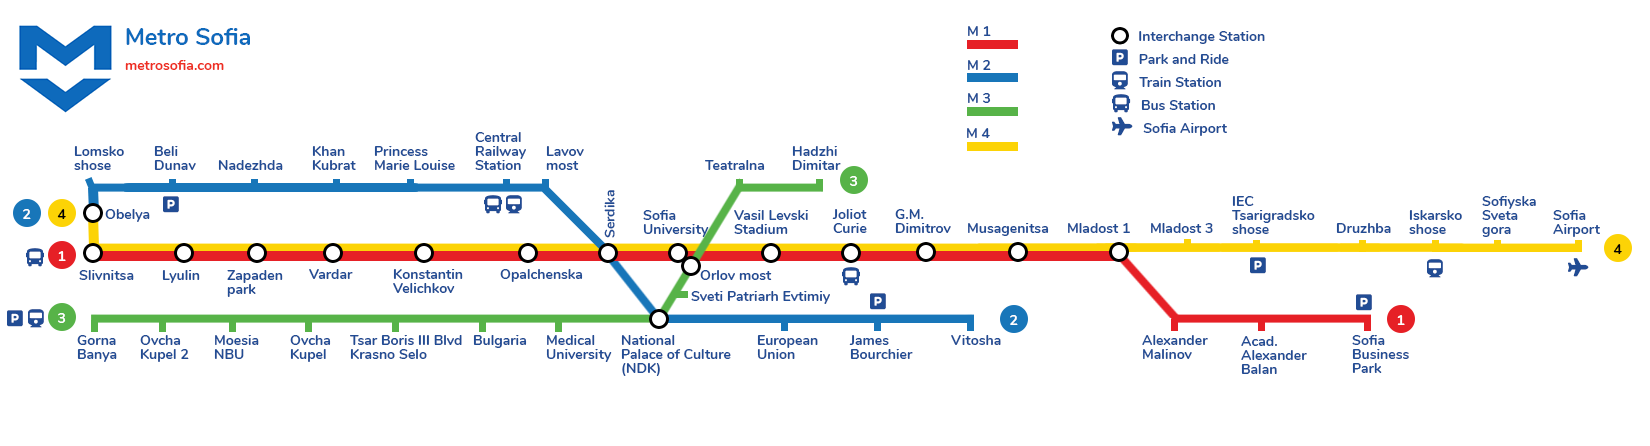 G Train Subway Map.Sofia Metro Map